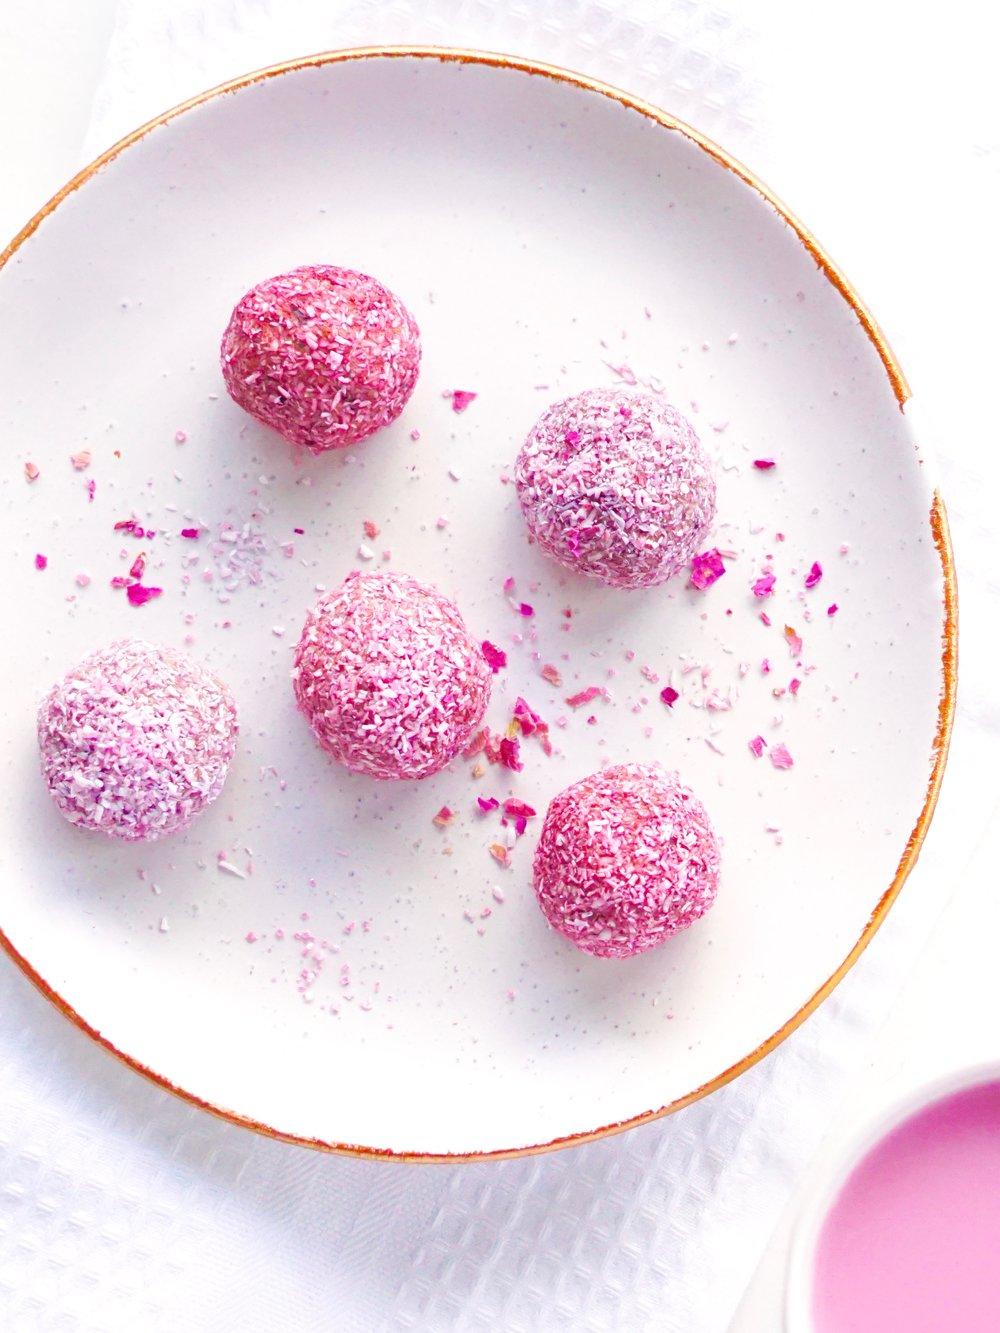 Tahini Cacao Bliss Balls